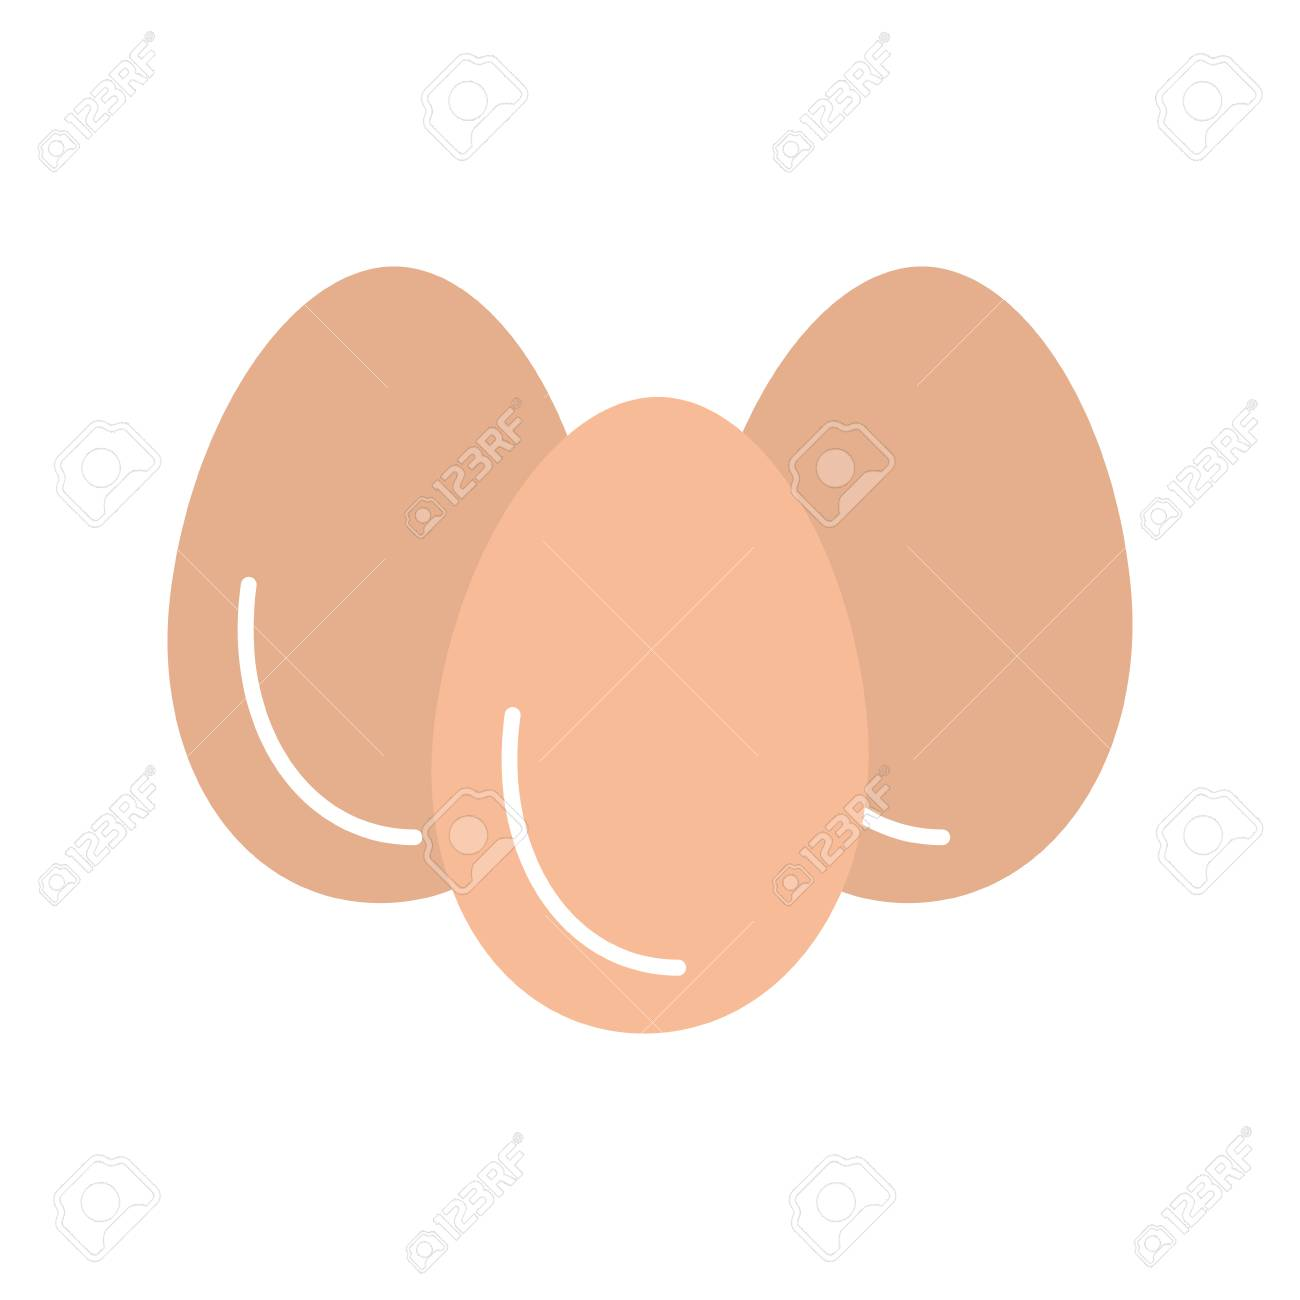 eggs vector illustration design - 81086114